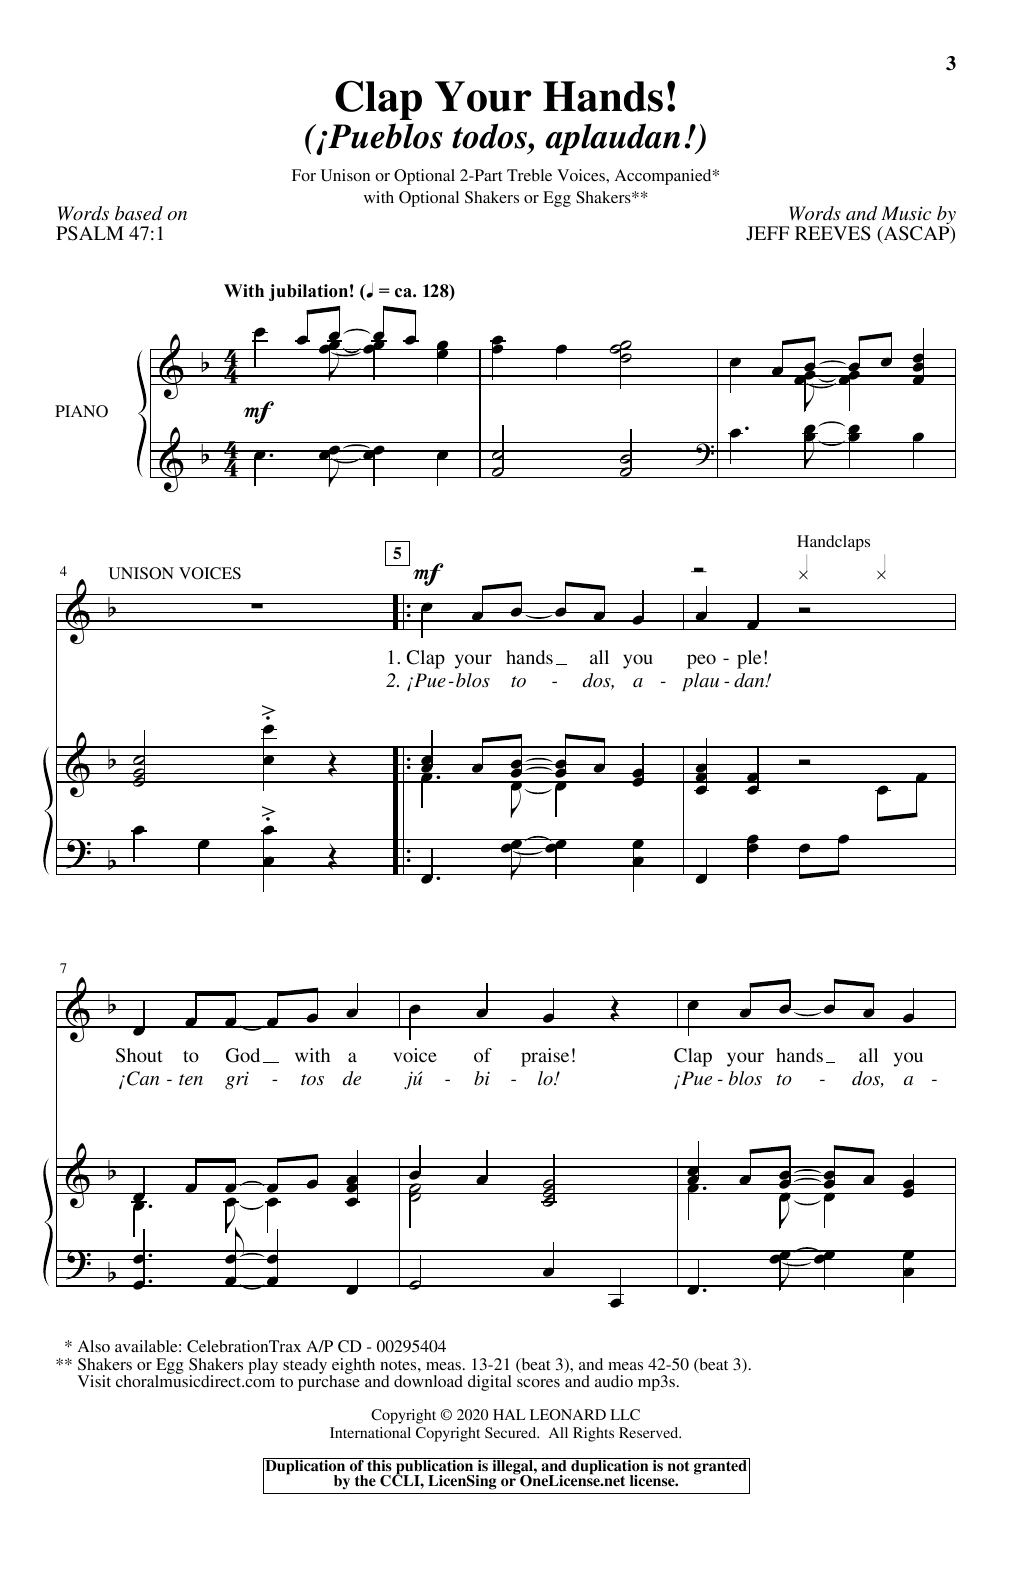 Clap Your Hands! (Pueblo todos, aplaudan!) (Unison Choir)